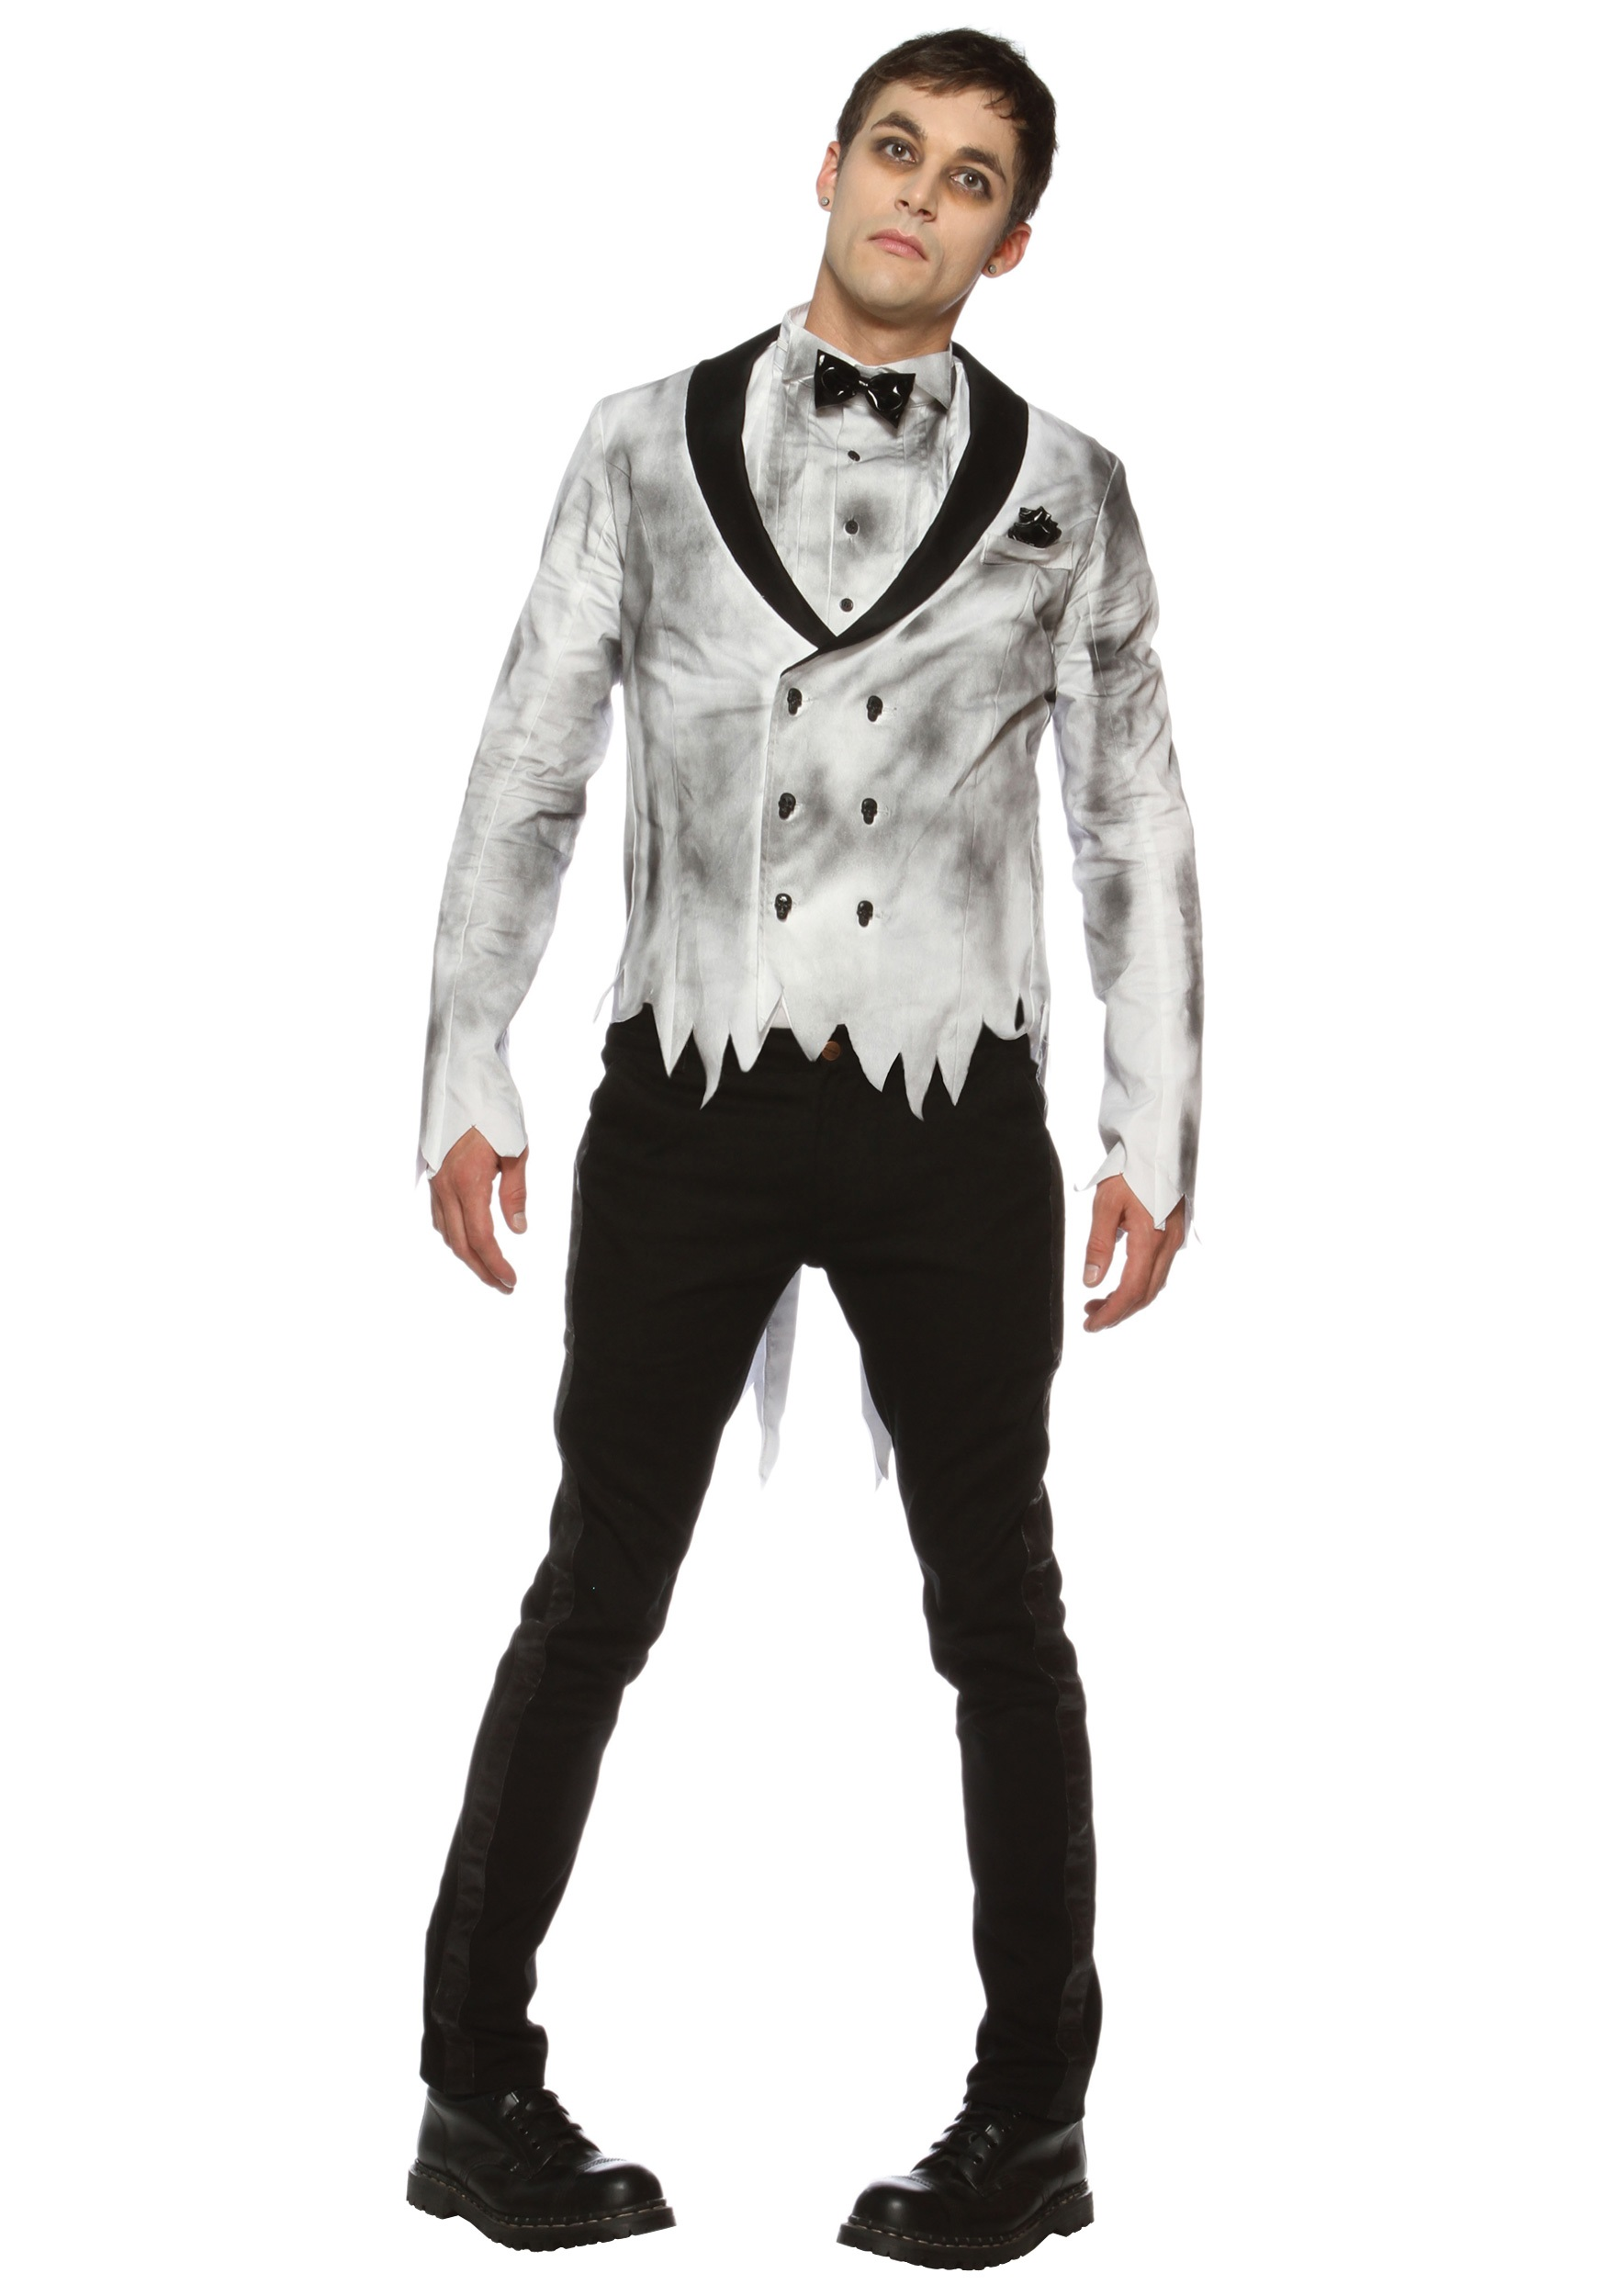 Bride And Groom Halloween Costume.Zombie Groom Costume